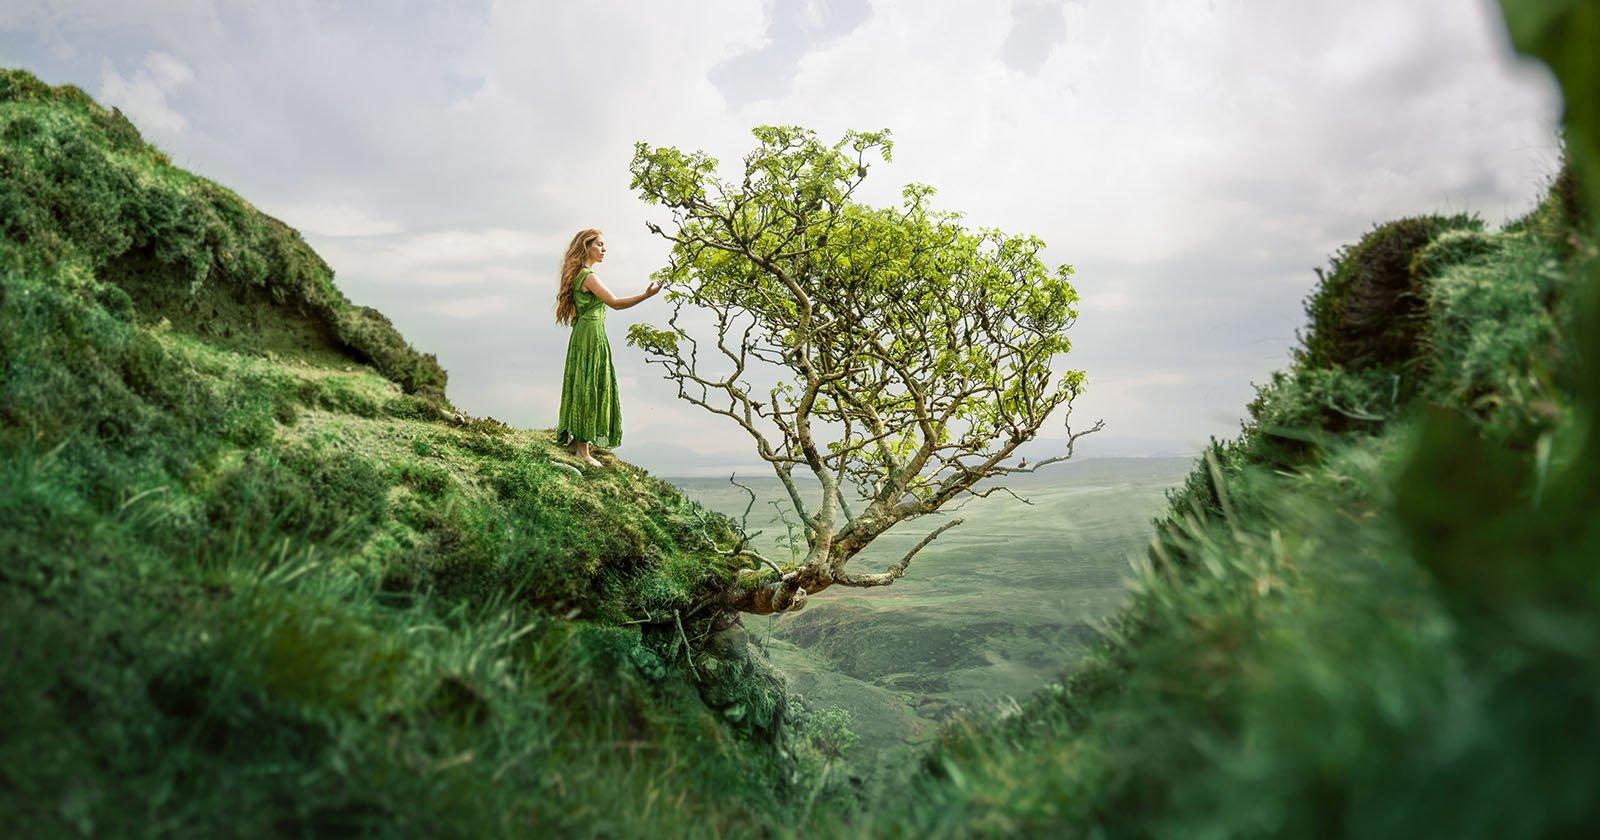 Inside the Mind of a Self-Portrait Landscape Photographer